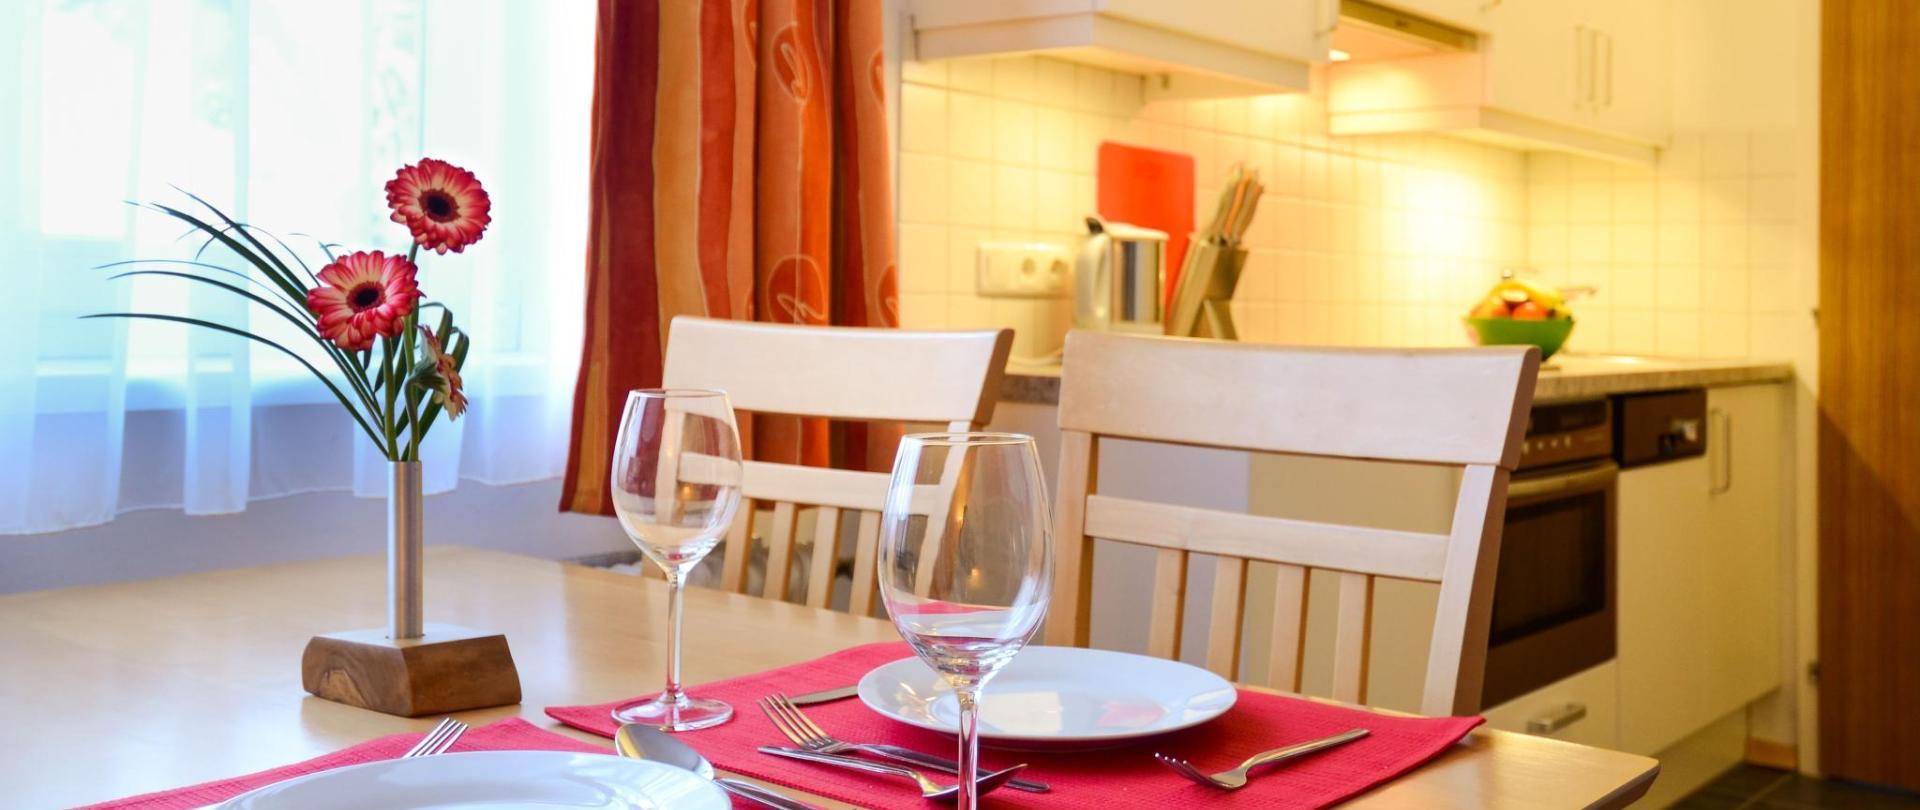 Haus Strutzenberger Dining Table.jpg